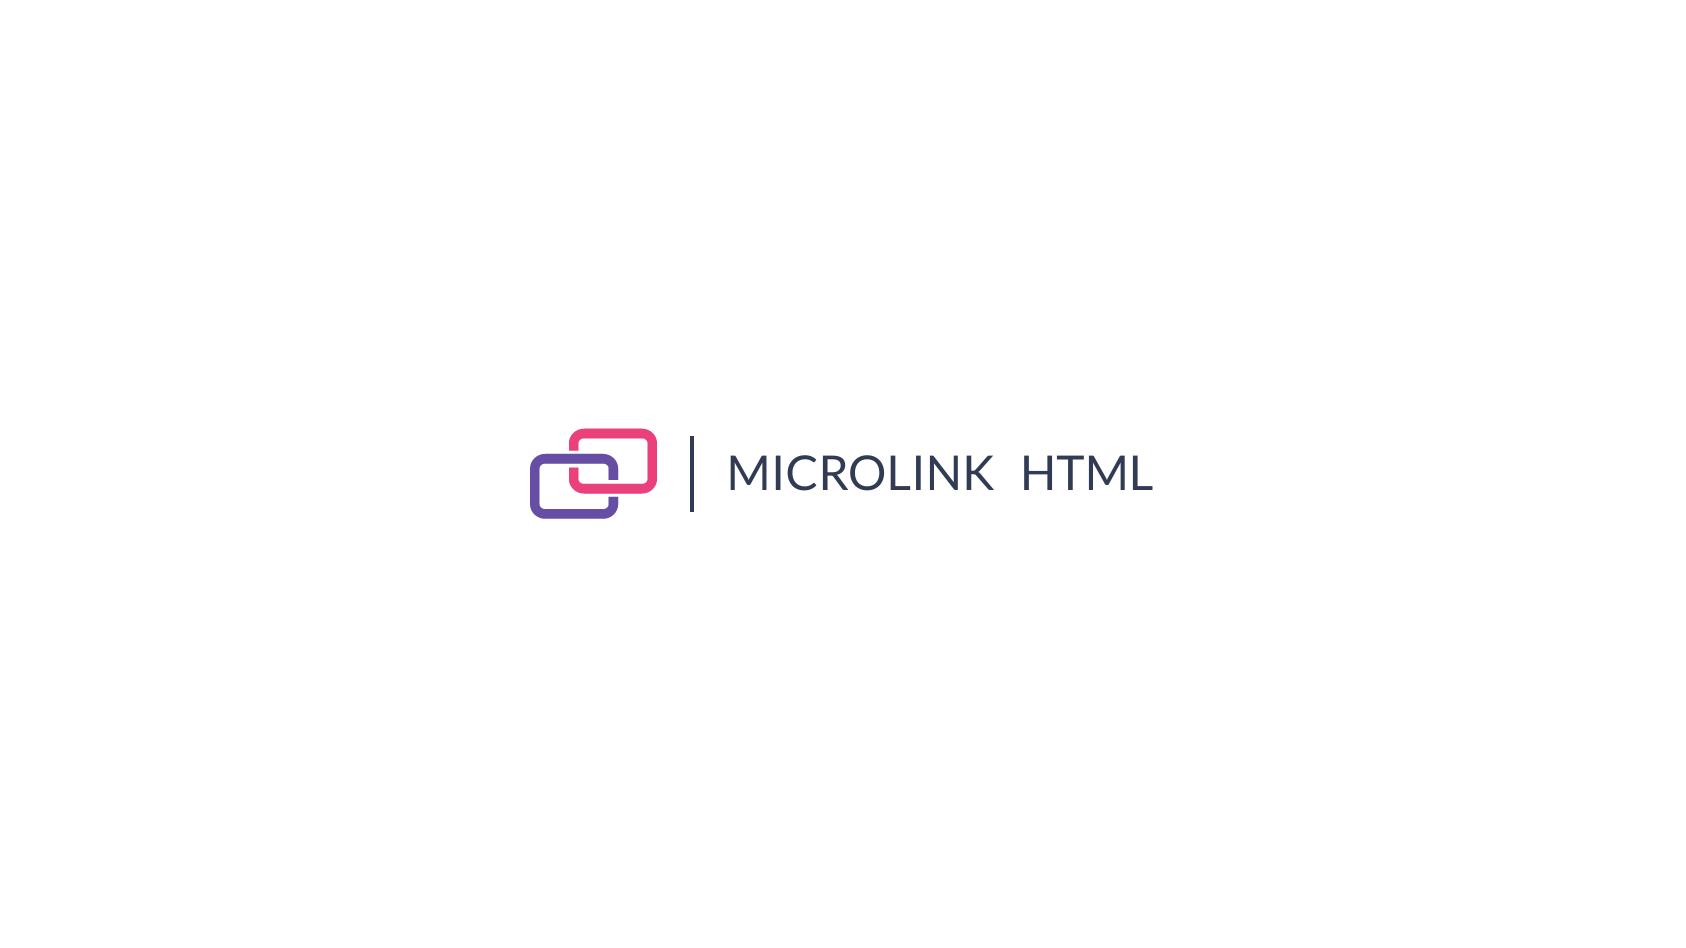 microlink html